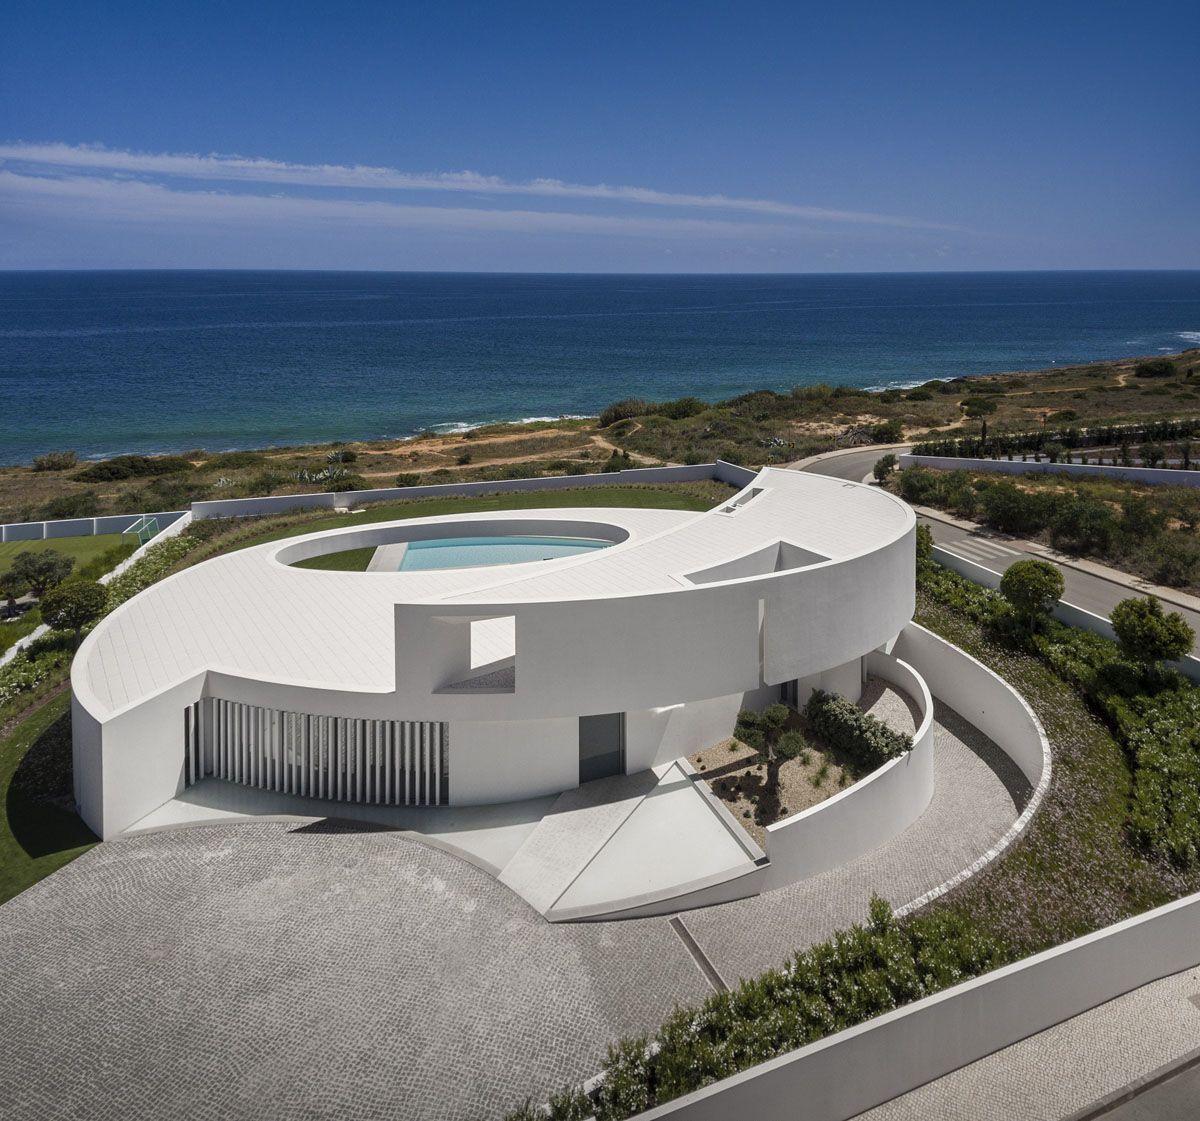 modern architectural design. Contemporary Elliptical House With Organic Architectural Design | IDesignArch Interior Design, Architecture \u0026 Decorating EMagazine Modern